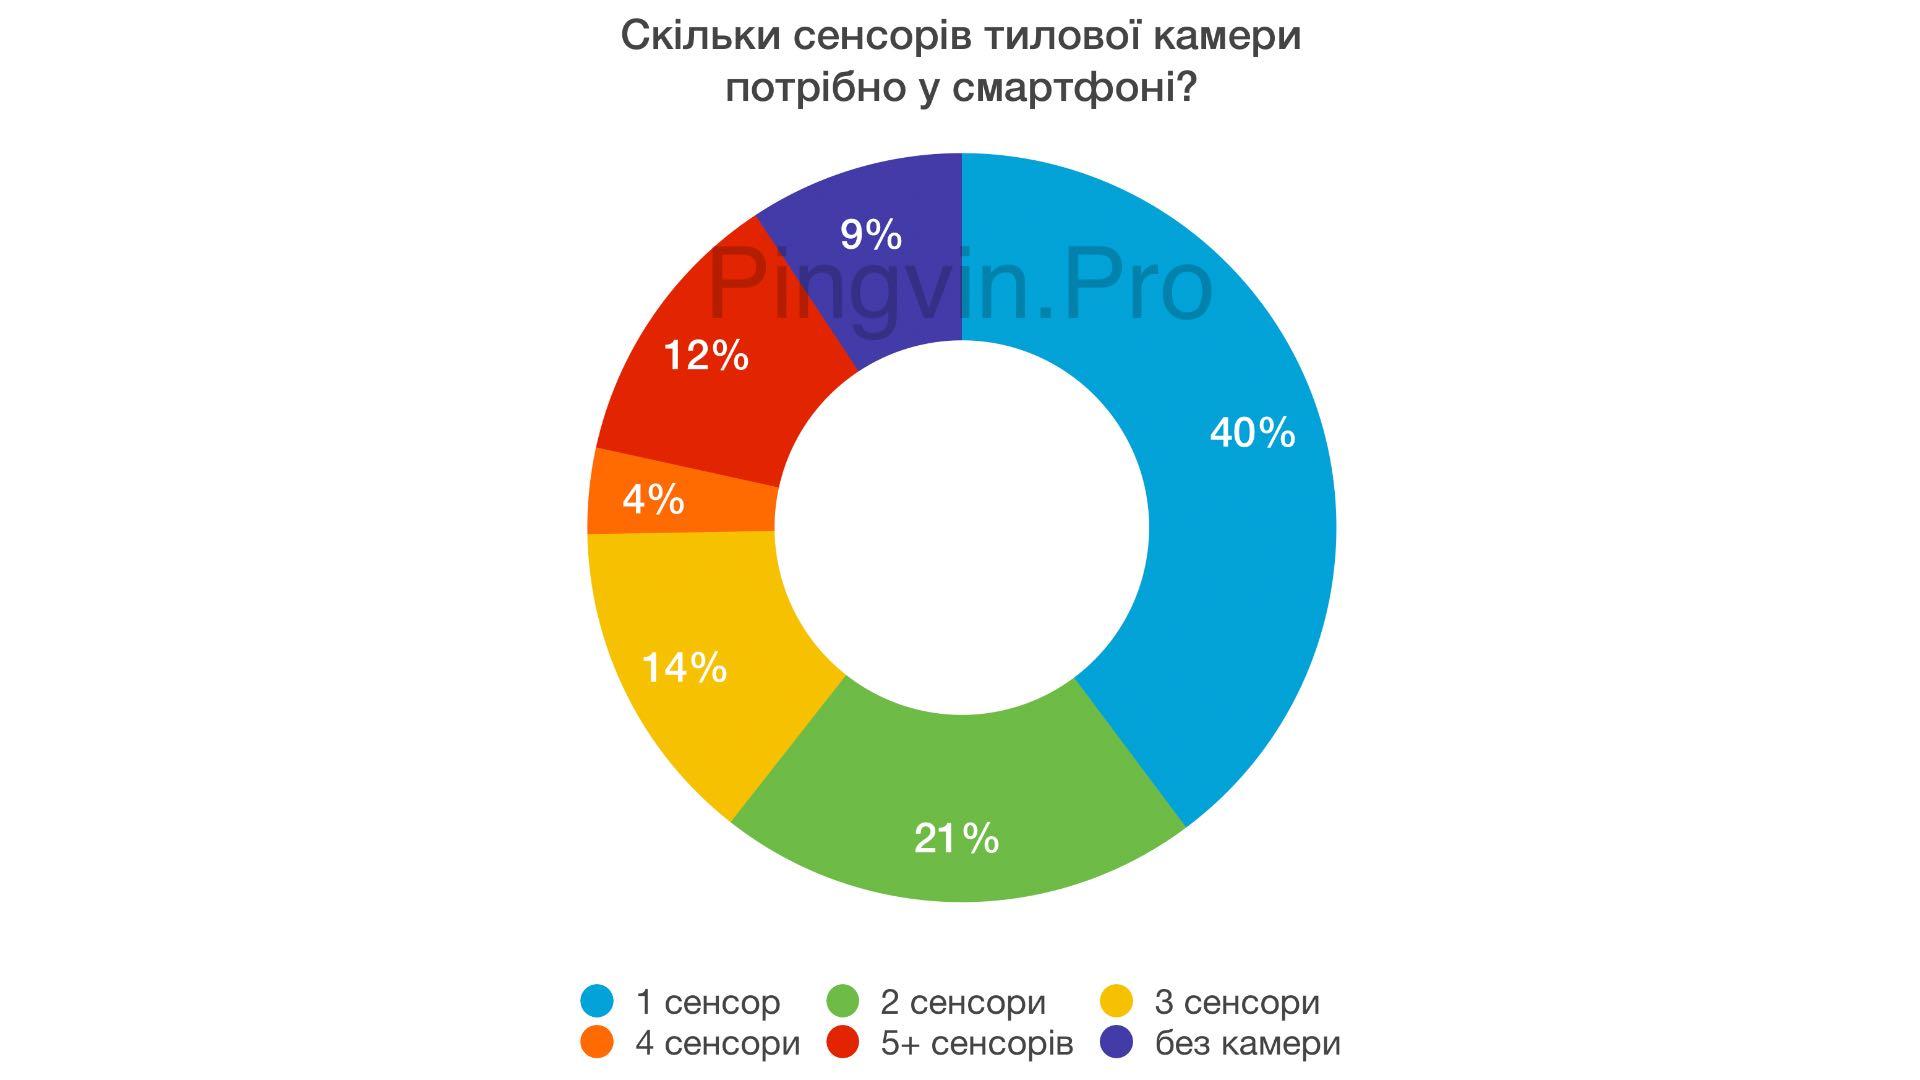 Тилова камера: статистика